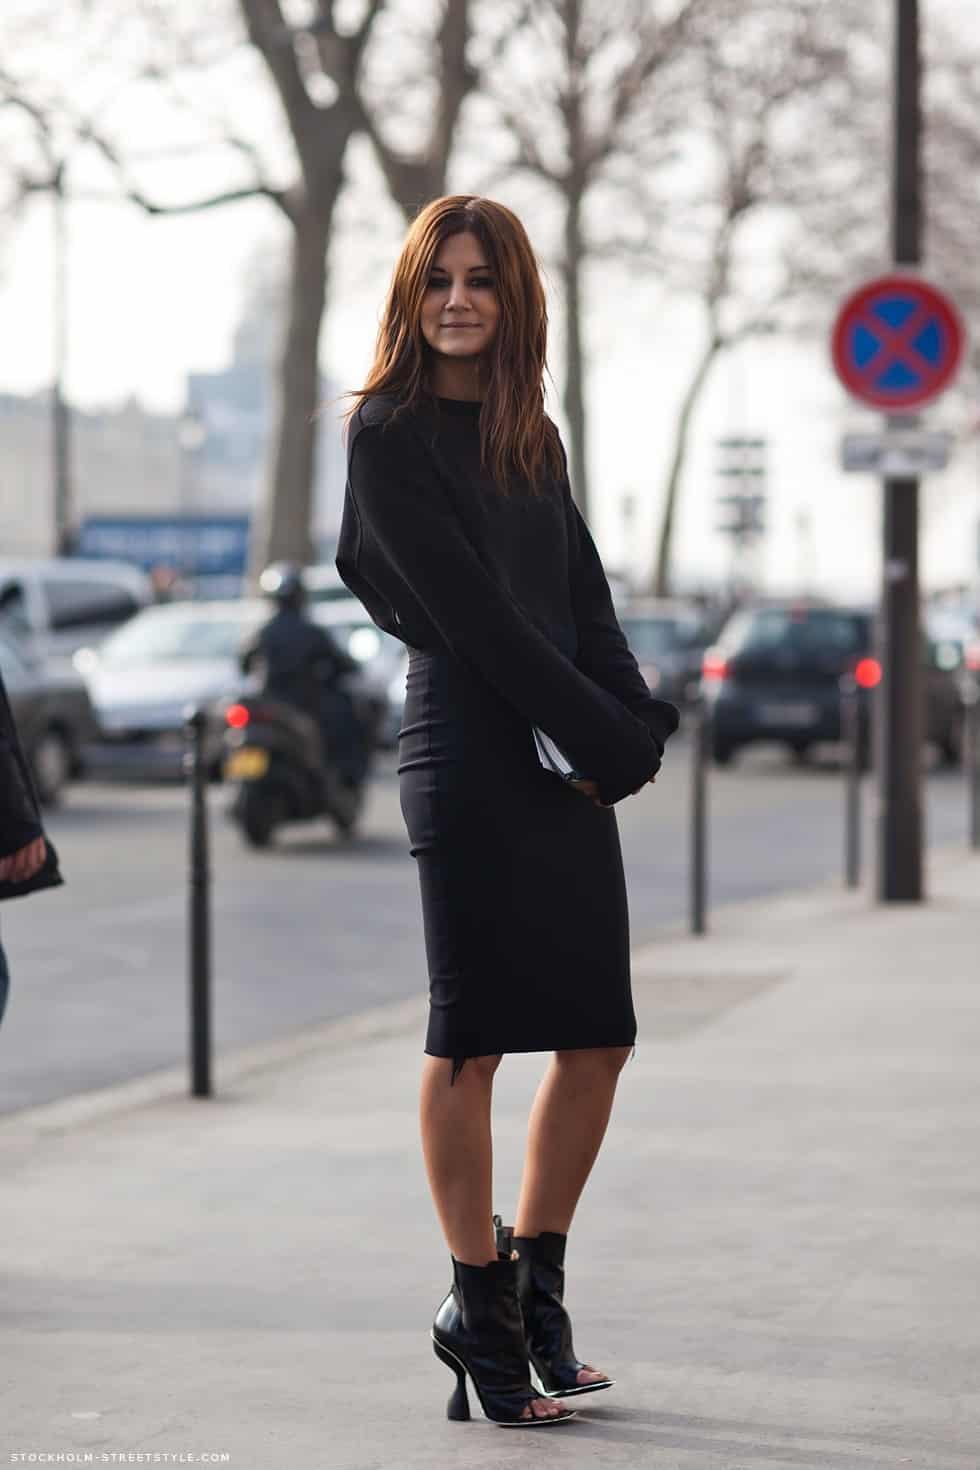 Christine Centenerapencil skirt